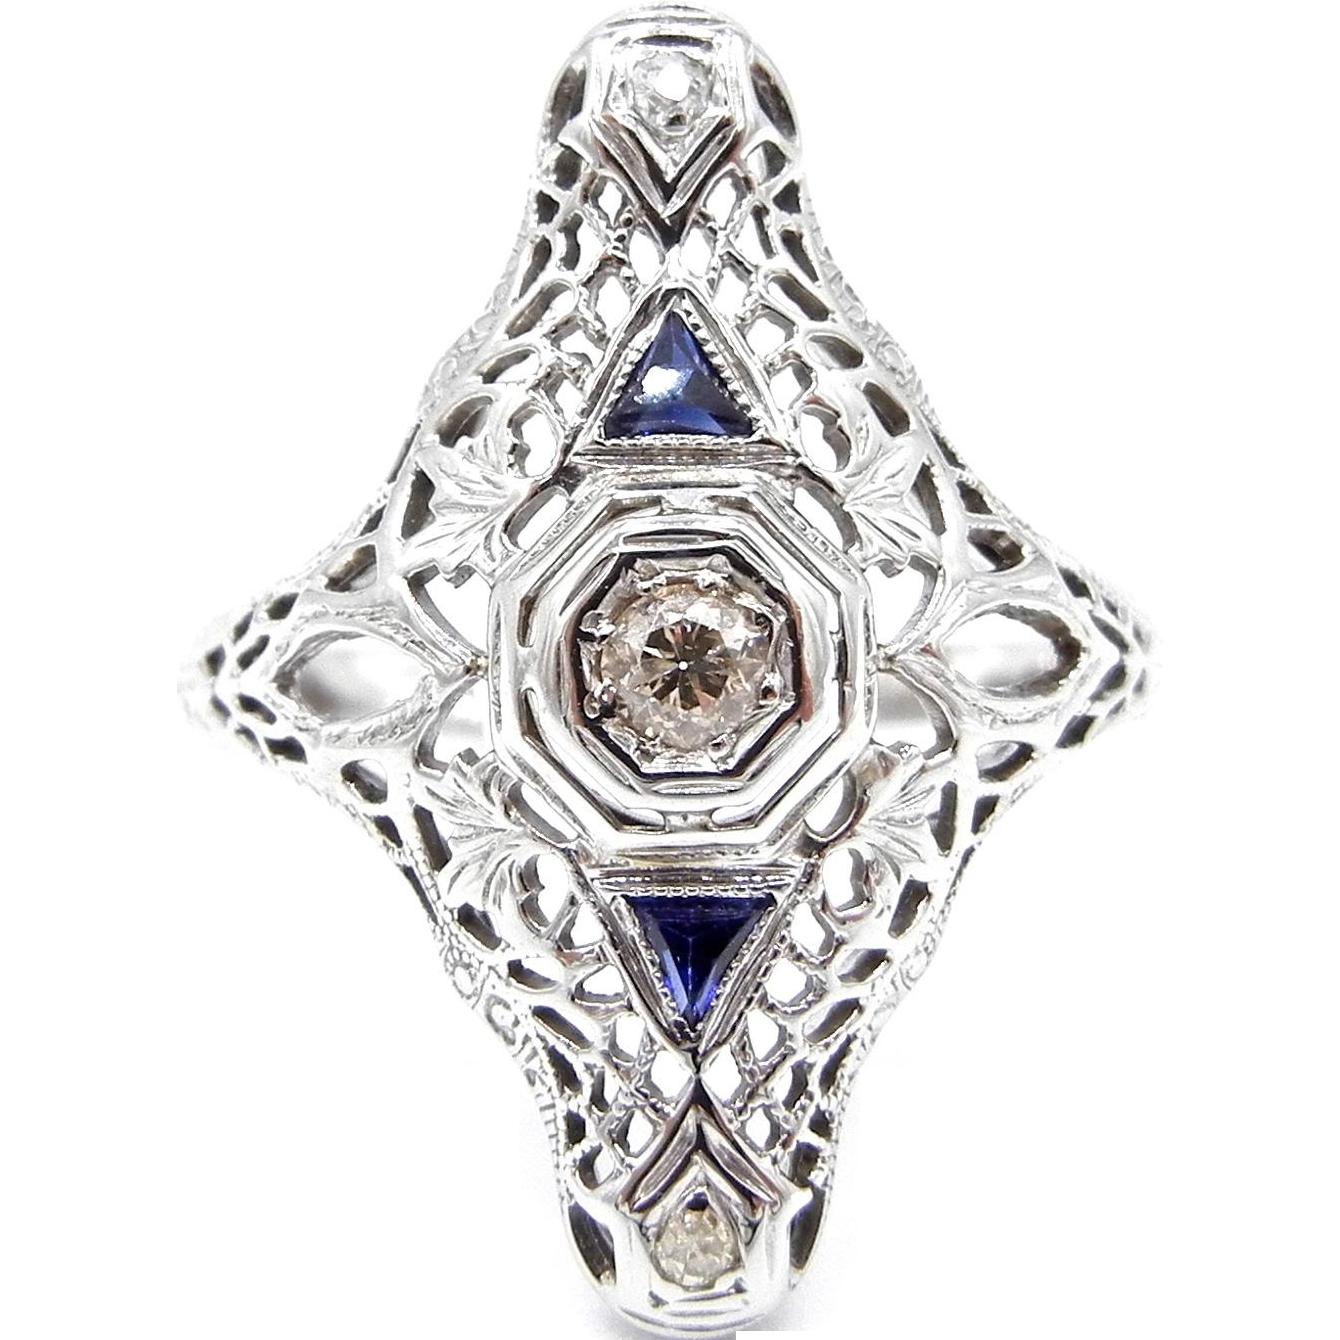 Art Deco 18 Karat White Gold Diamonds and Sapphires Filigree Ring